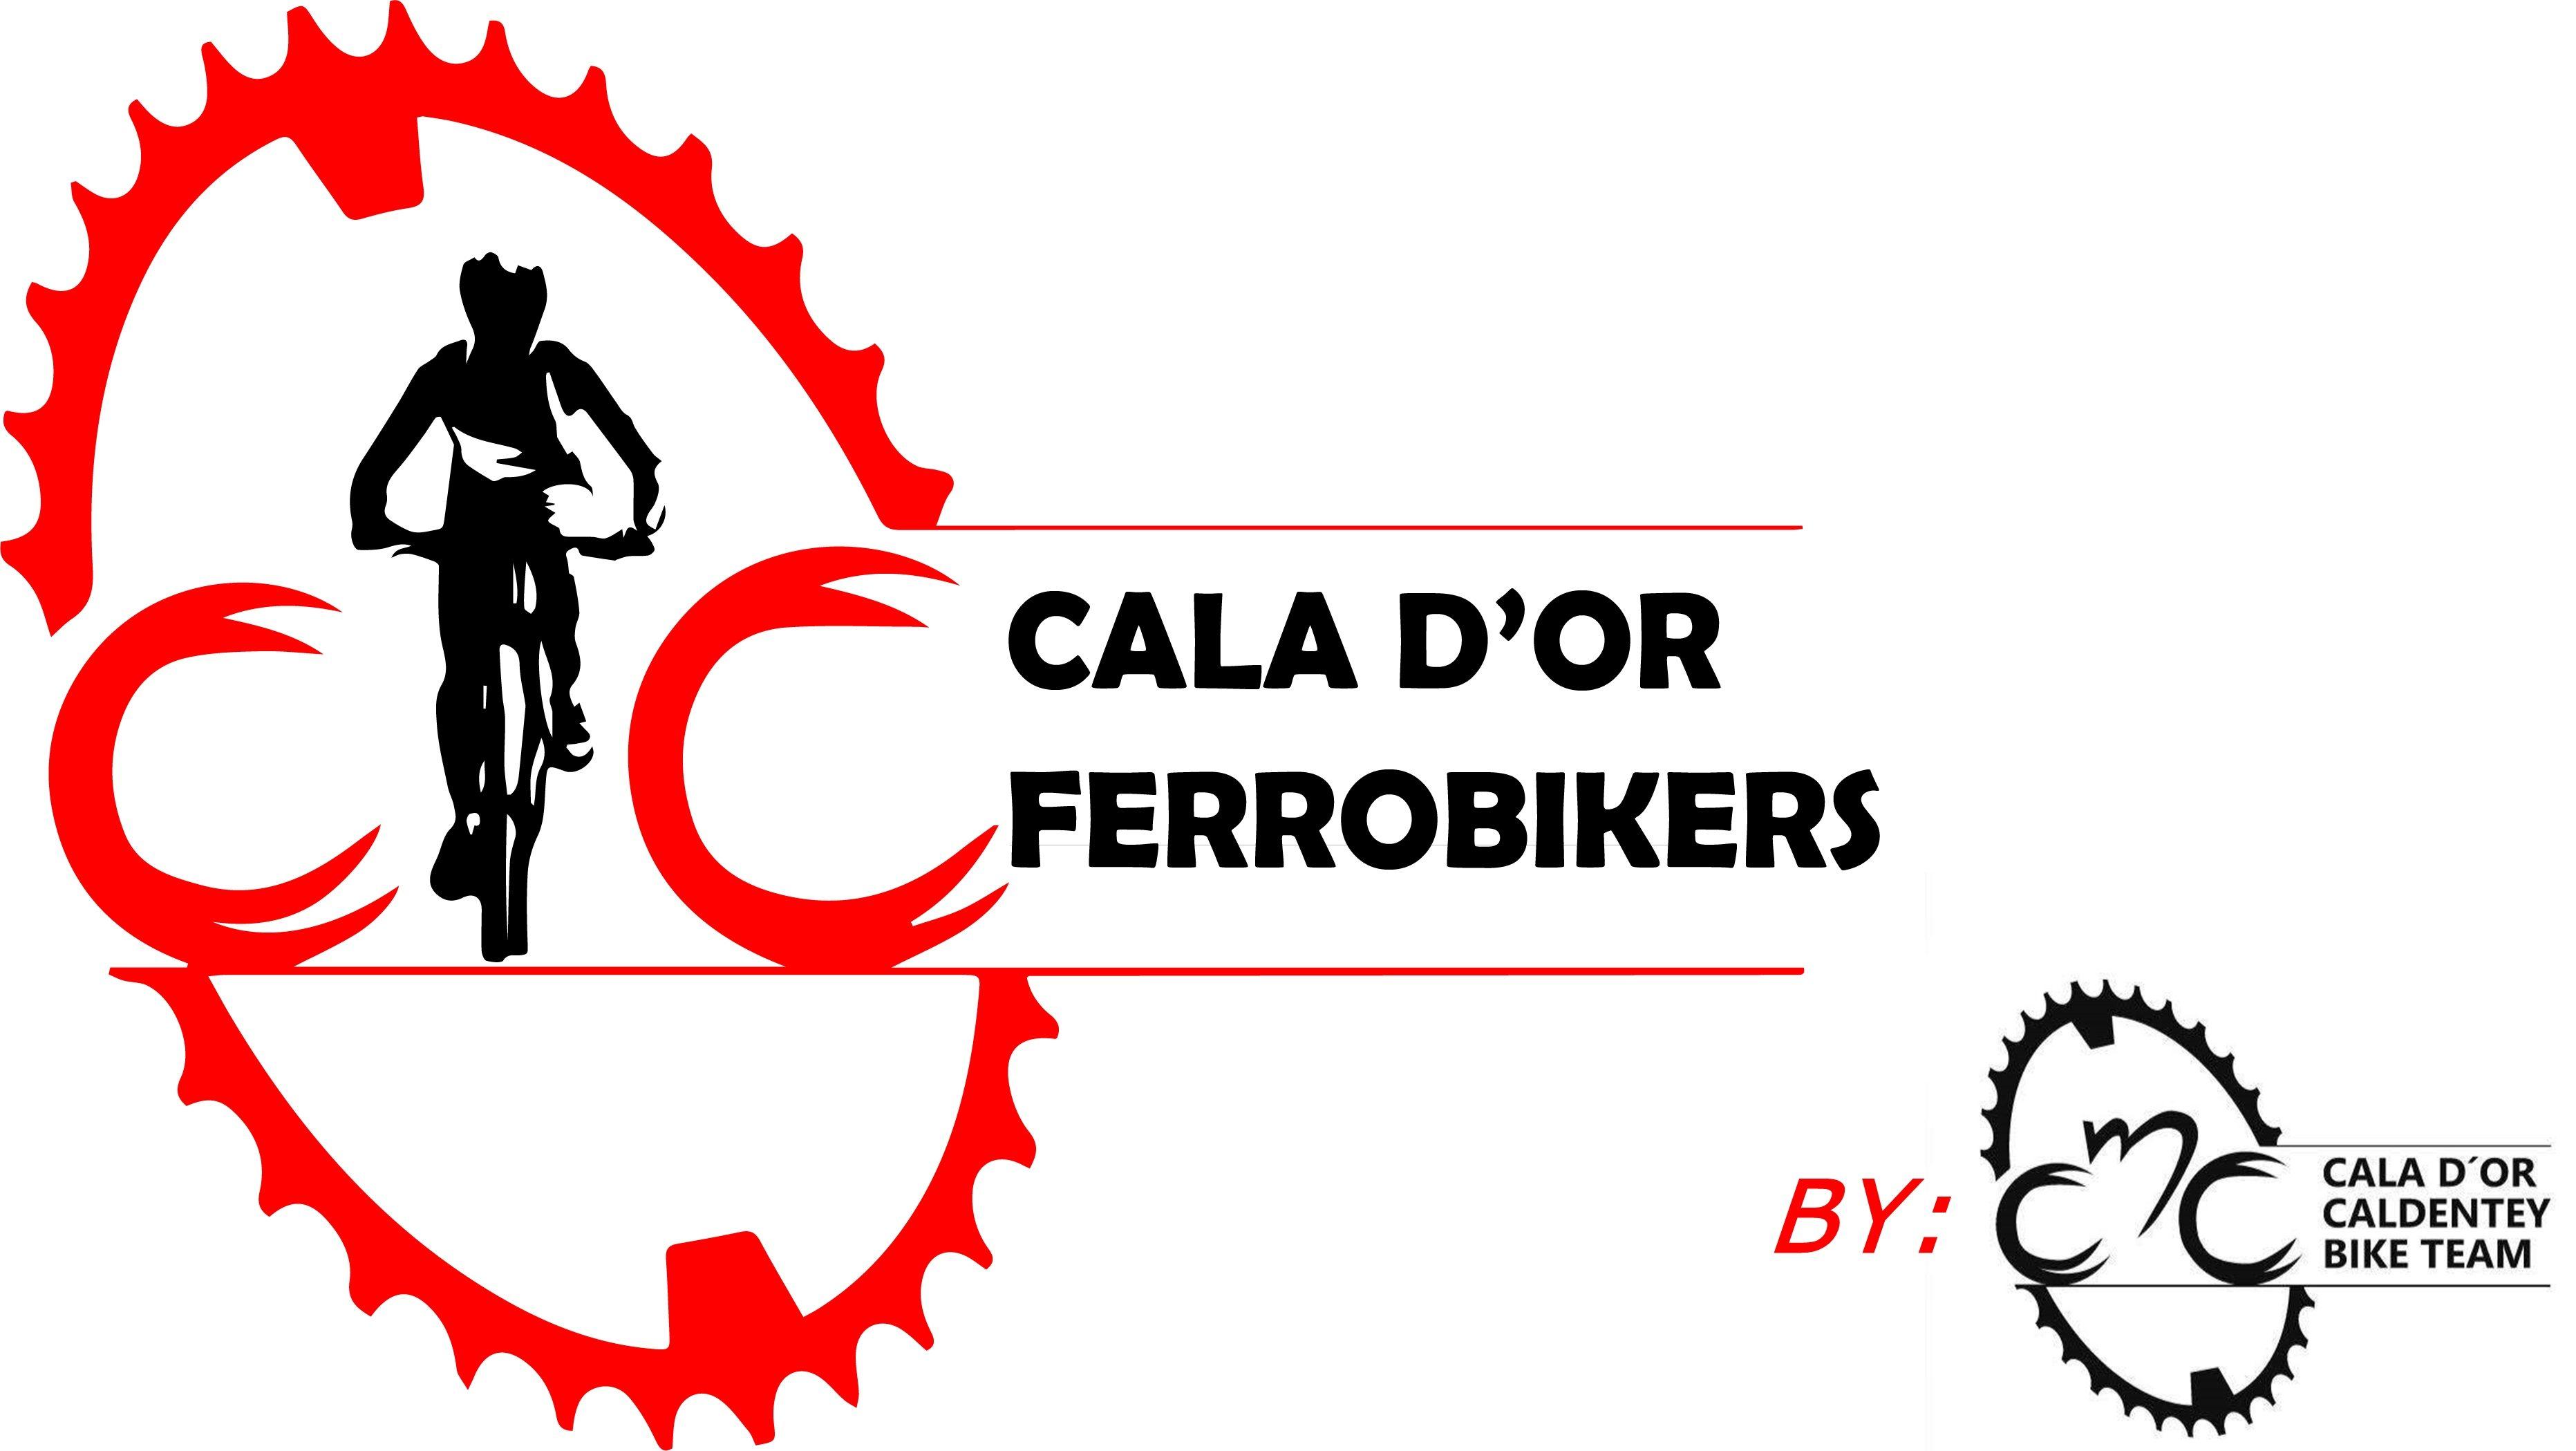 cala d'or ferrobikers